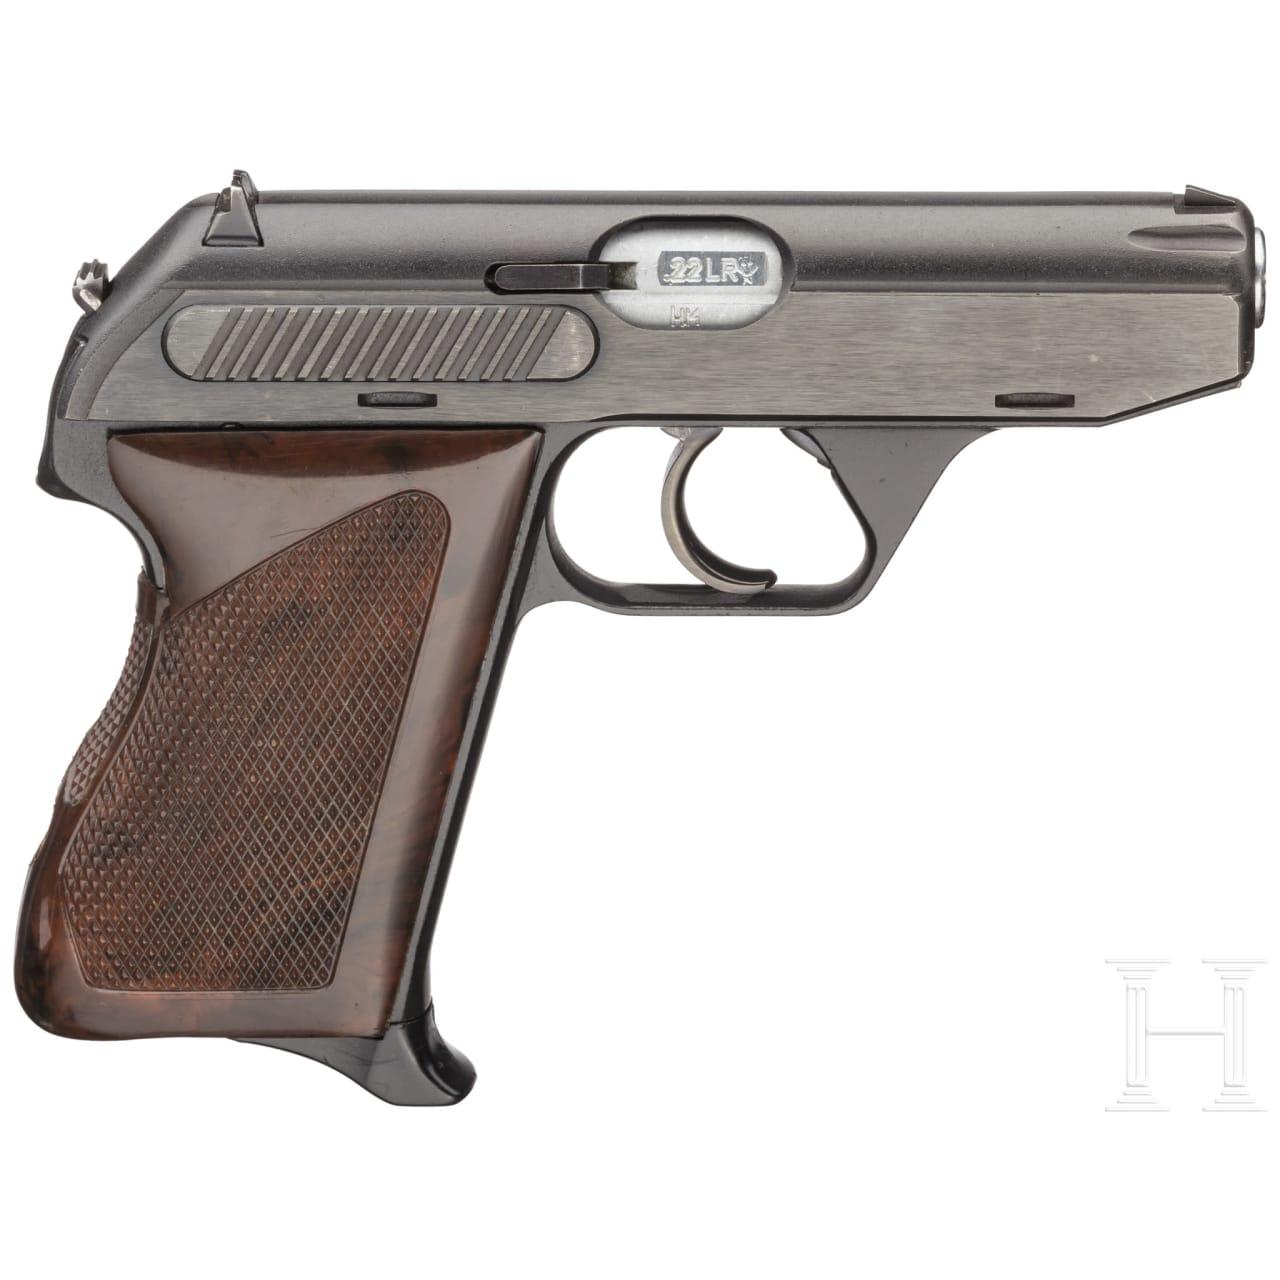 A cased Heckler & Koch M HK 4